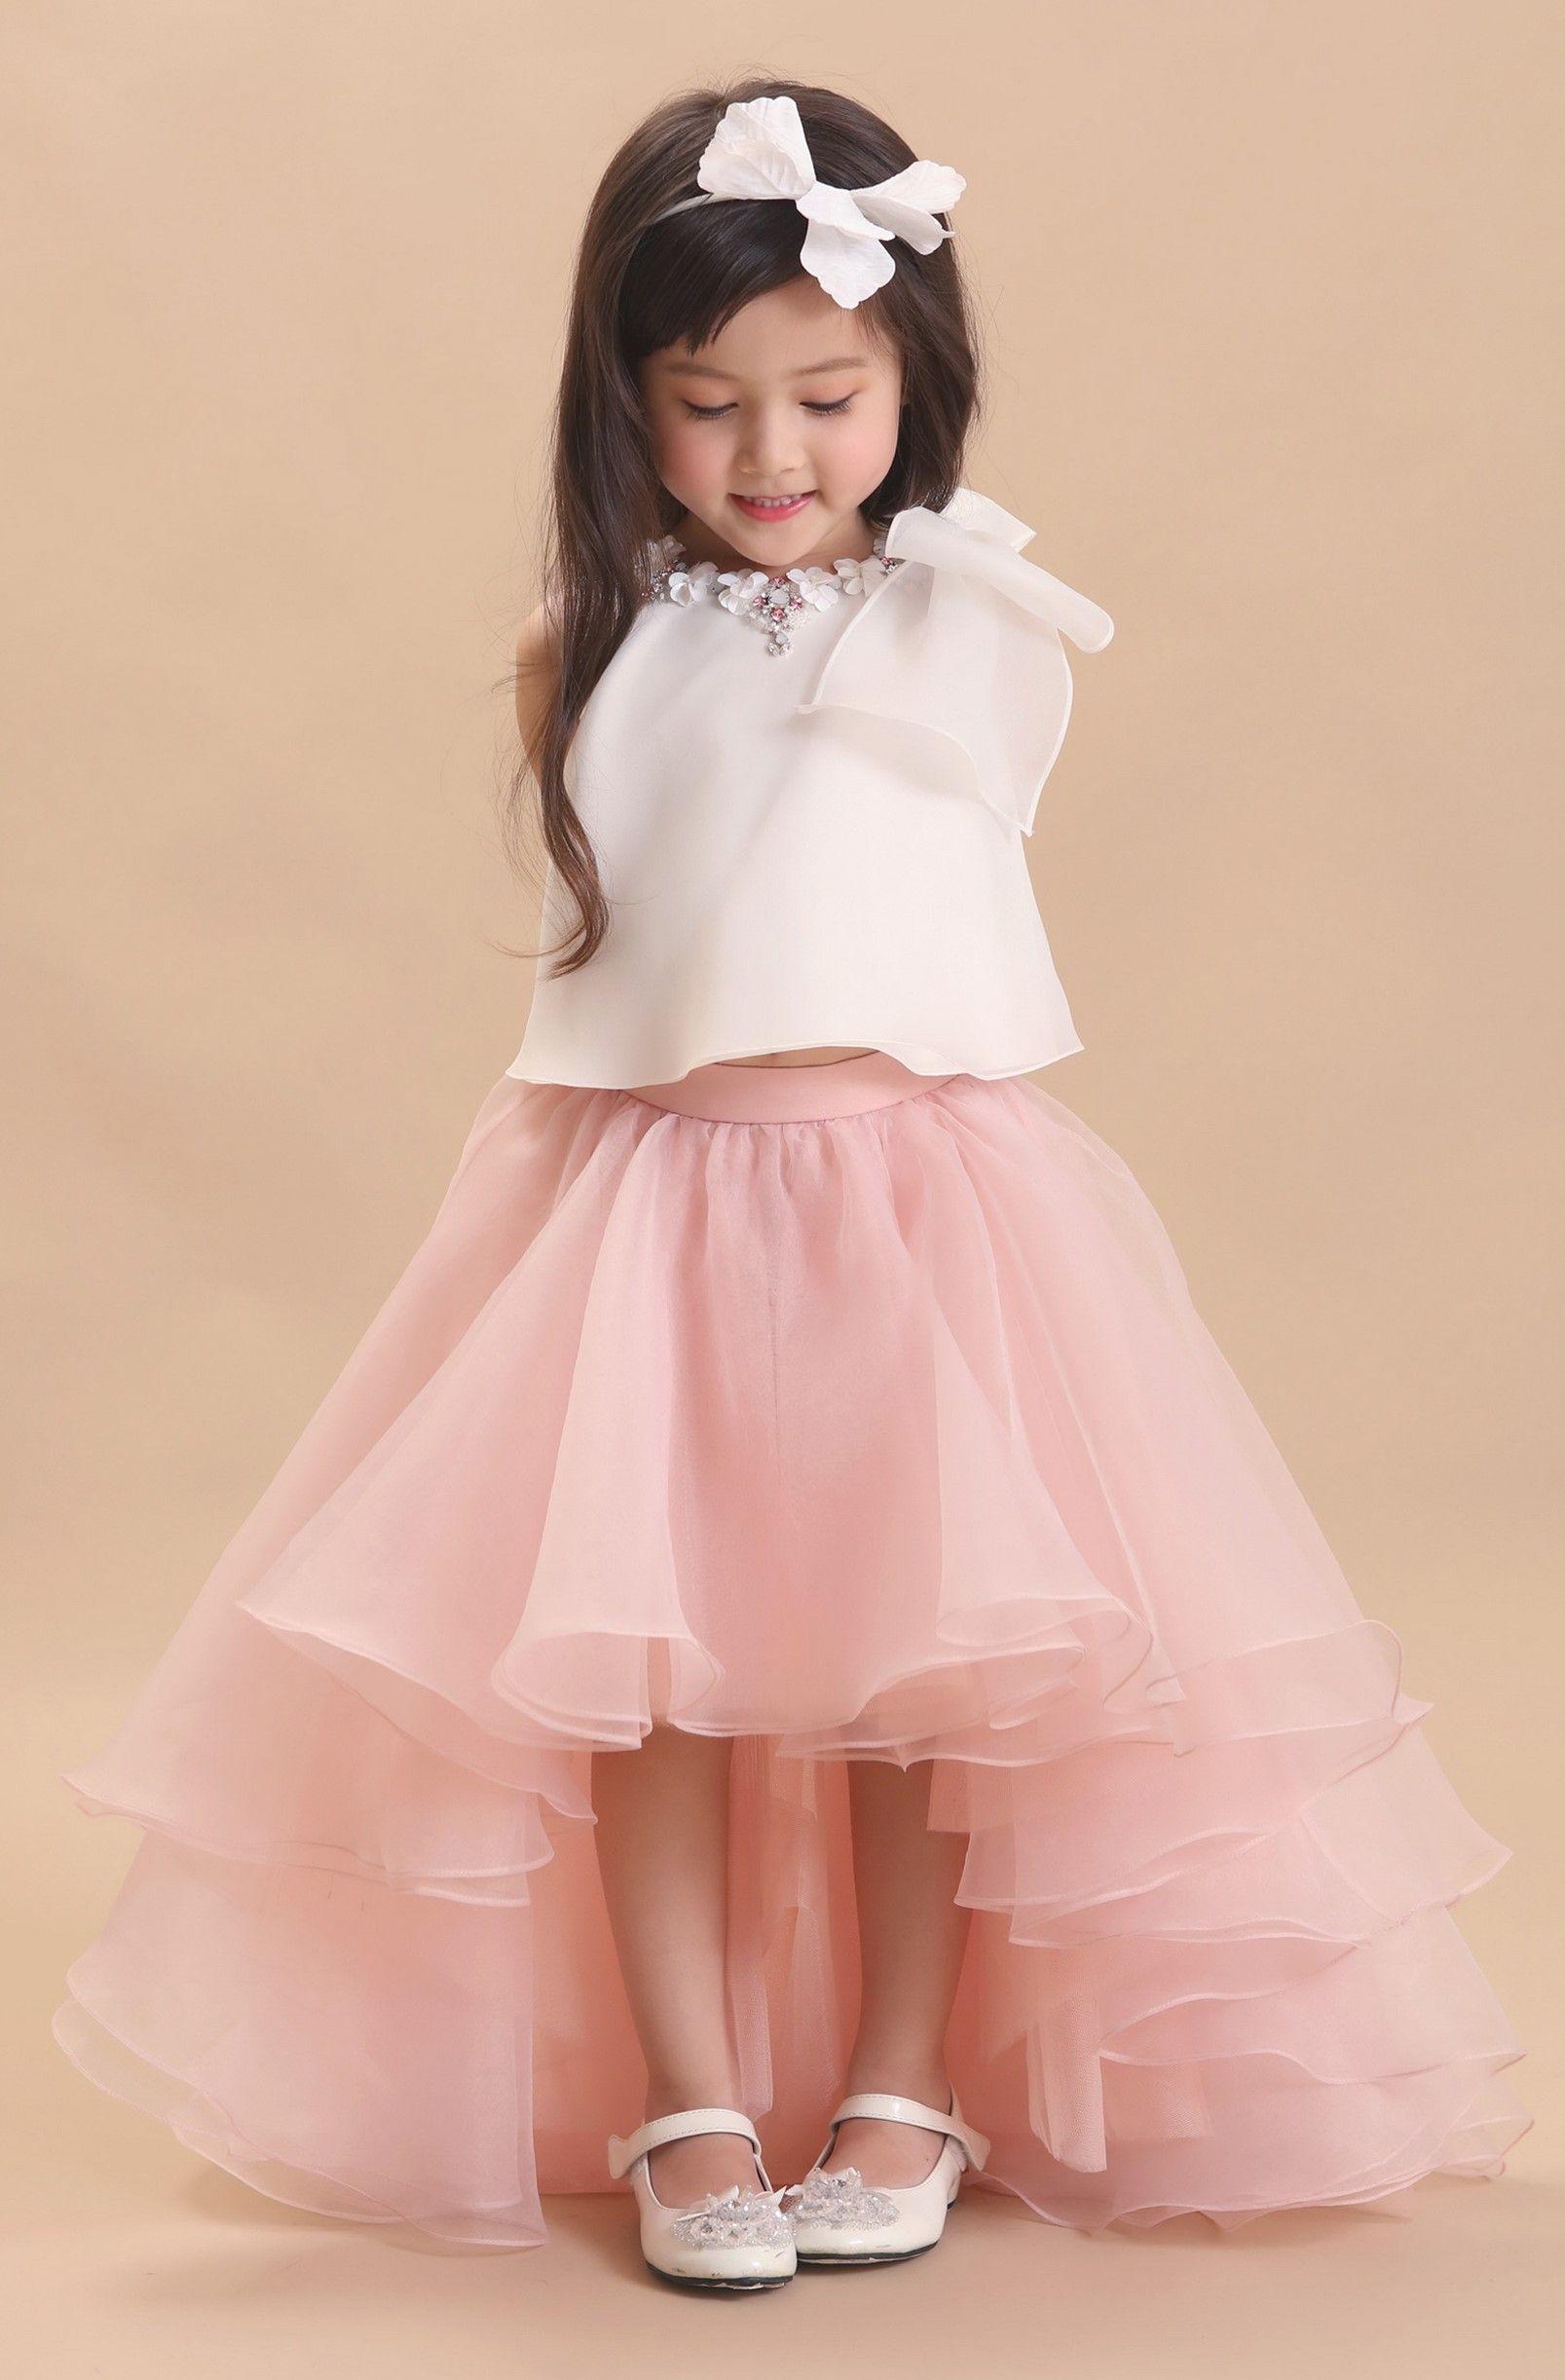 DORIAN HO Baby Doll FW 17/18 | Для детей | Pinterest | Vestidos de ...